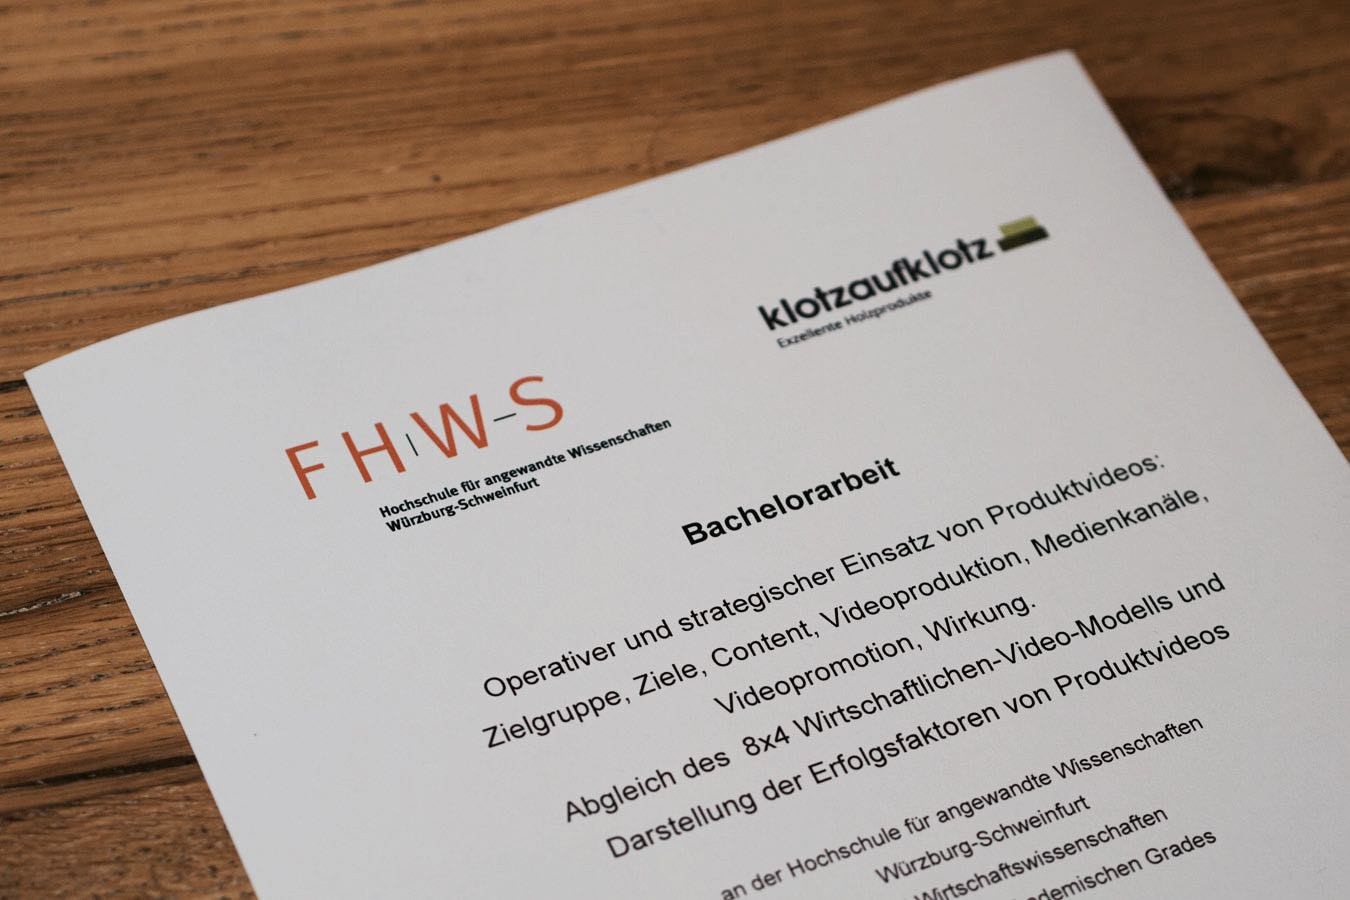 bachelorarbeit-fhws-moni